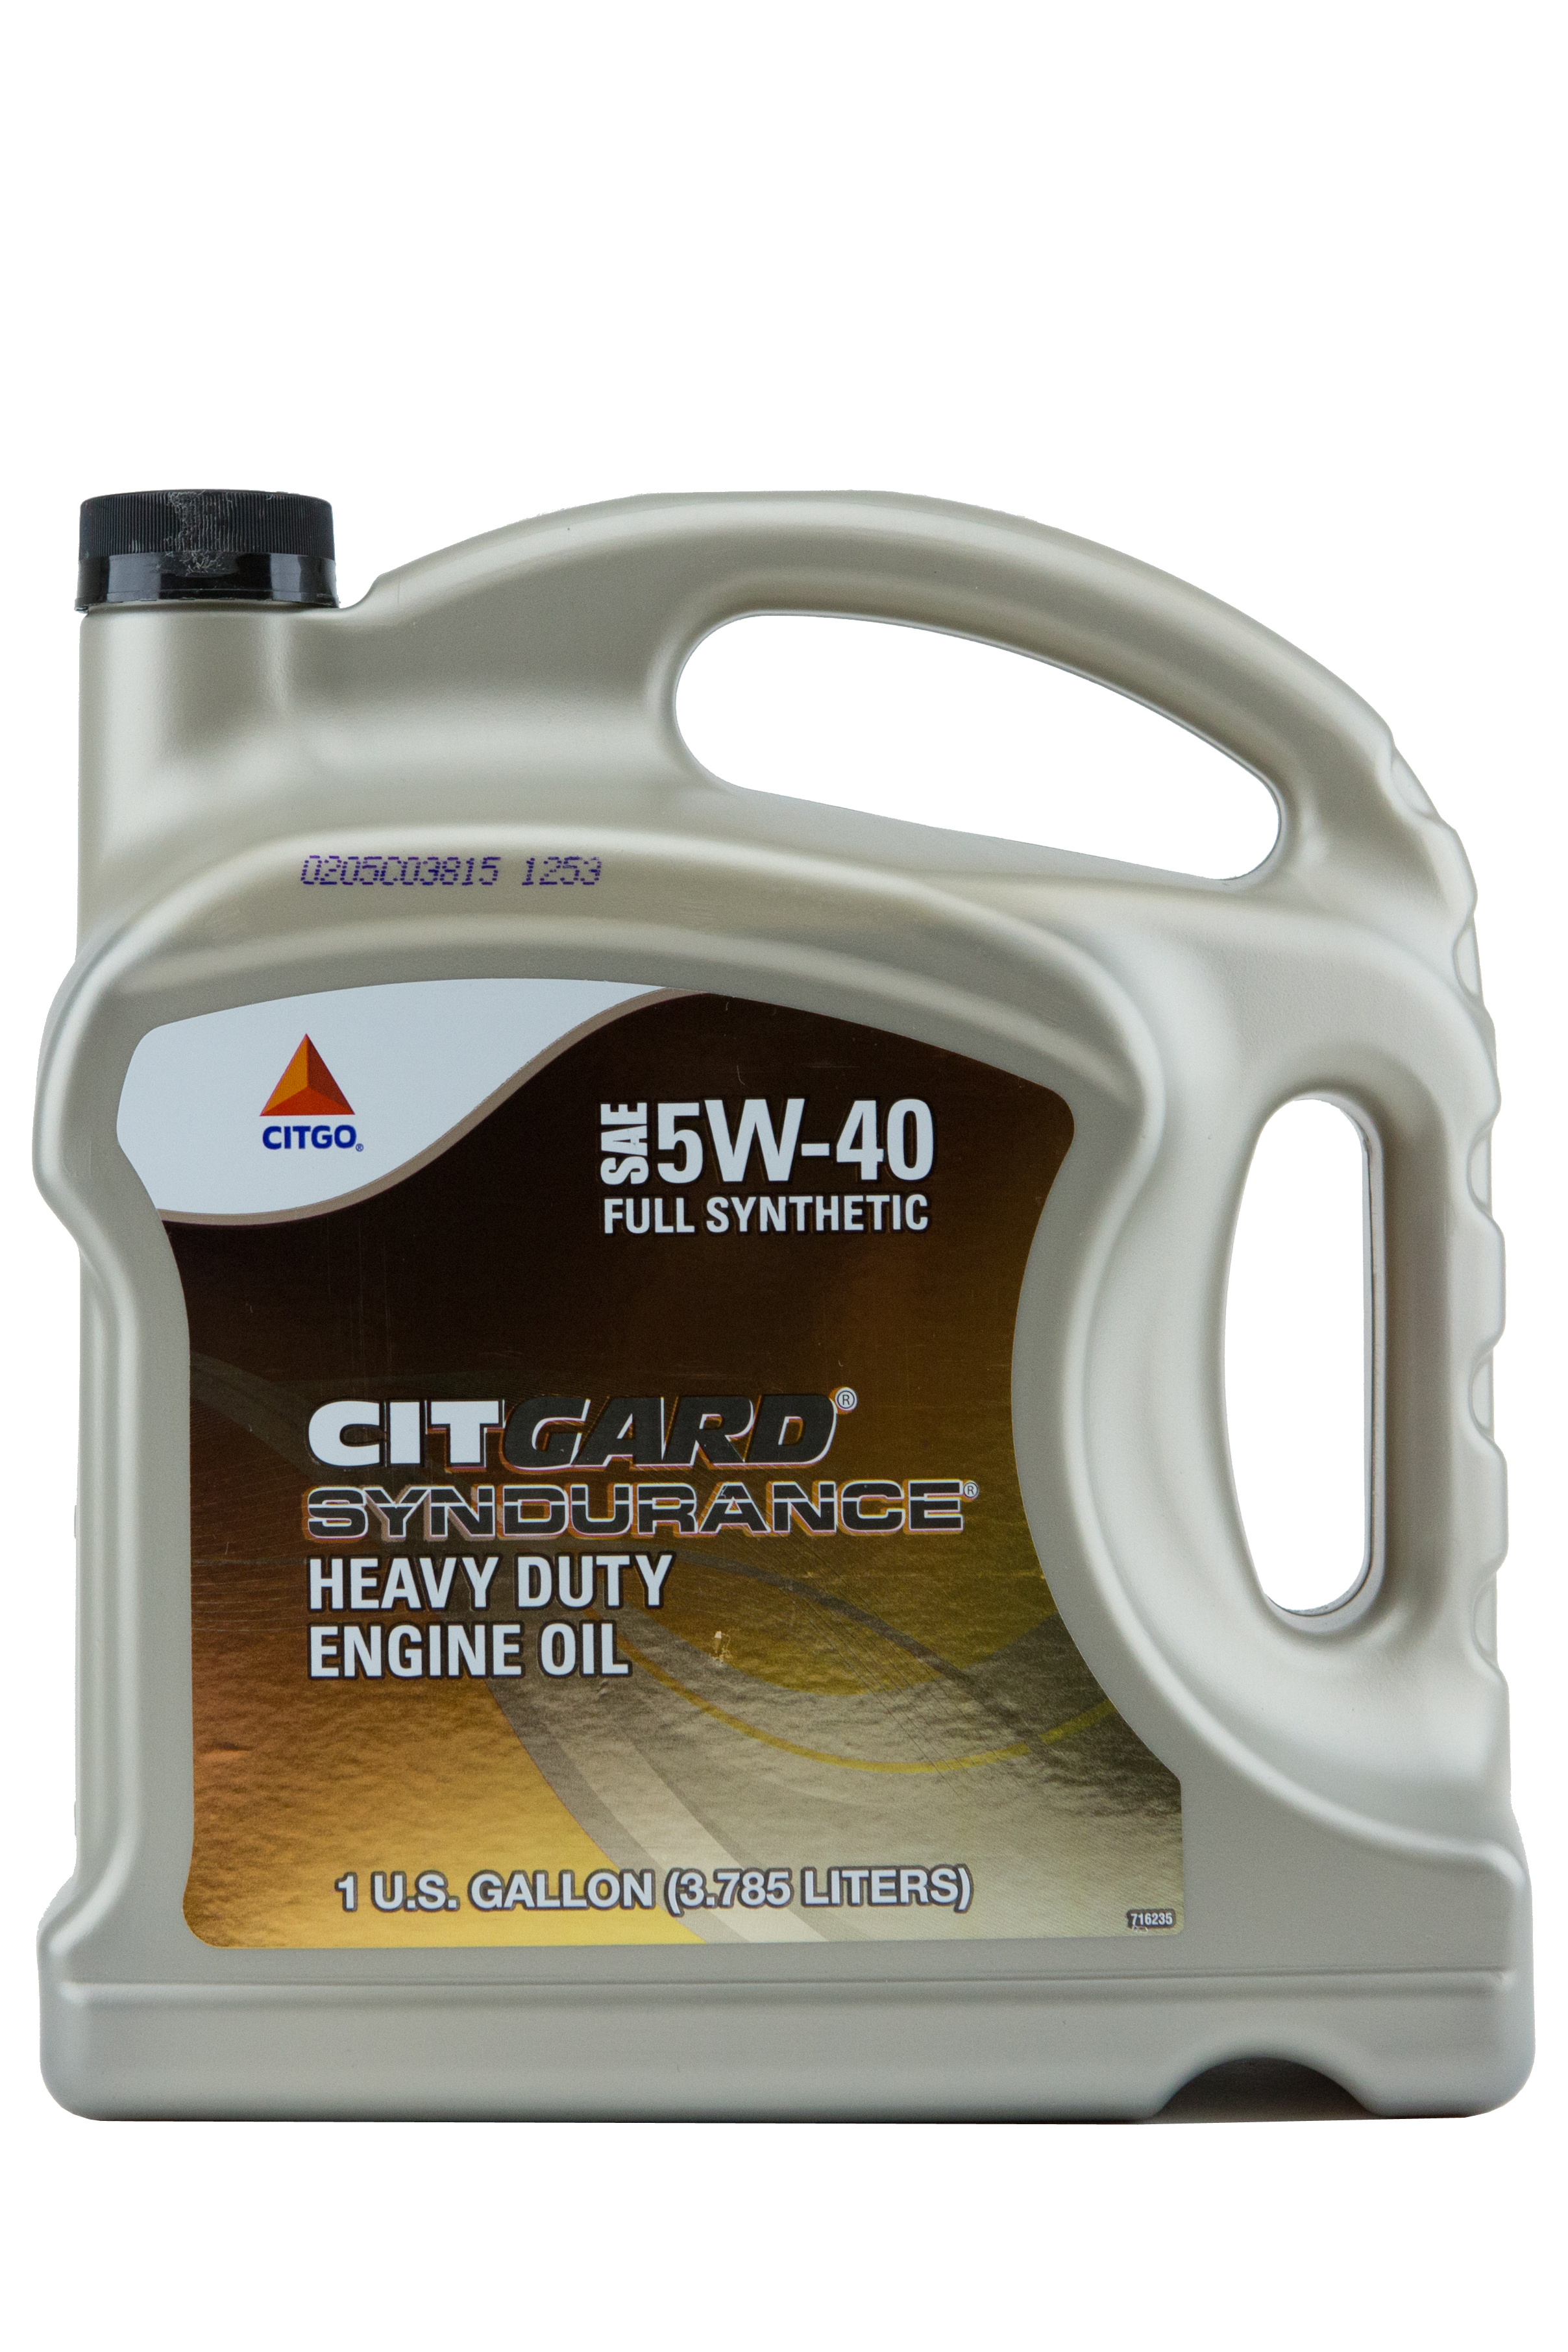 Buy Citgo Citgard Syndurance 5w40 Heavy Duty Engine Oil